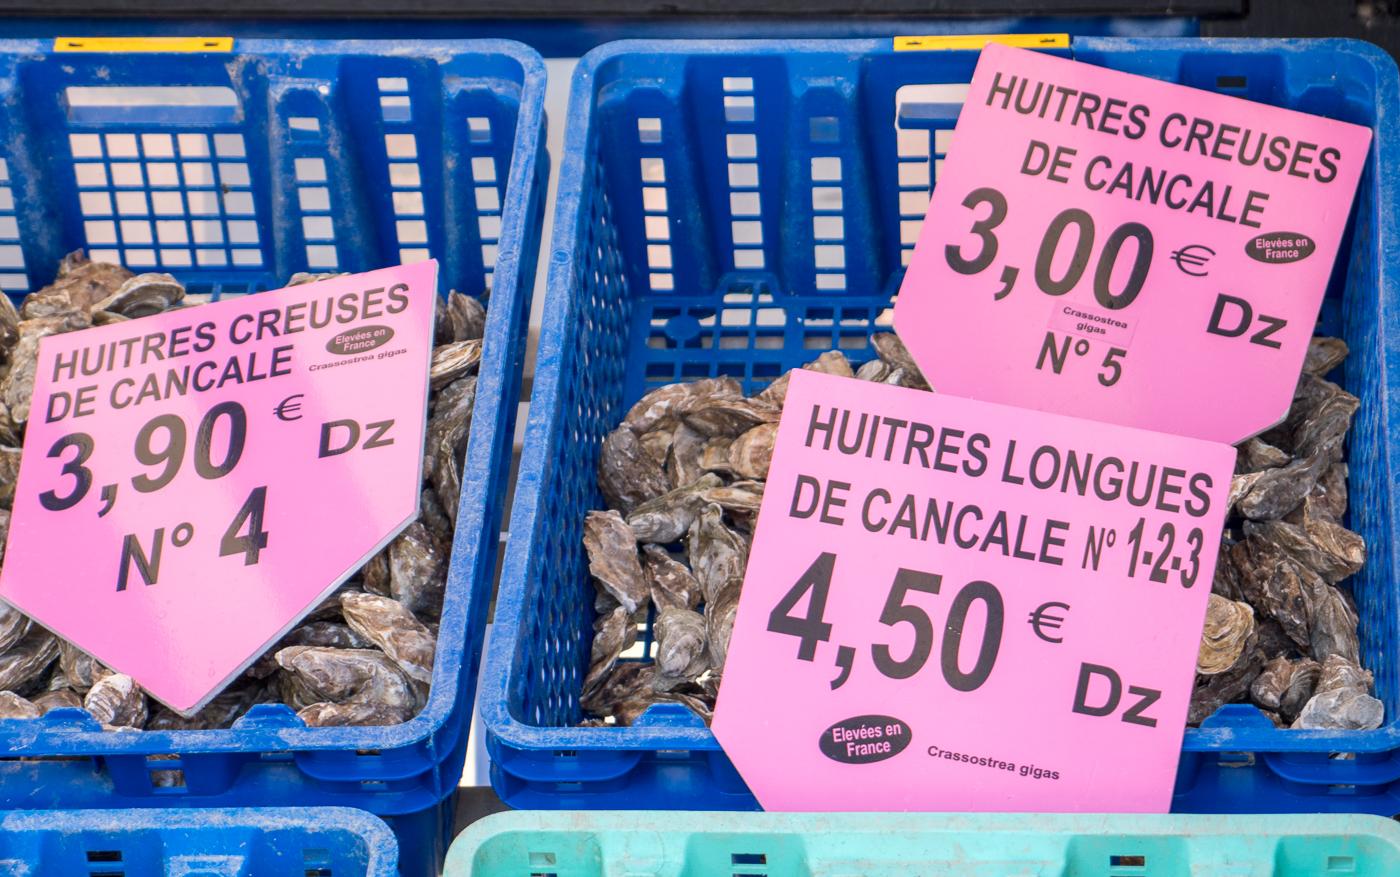 Huîtres de Cancale en bac